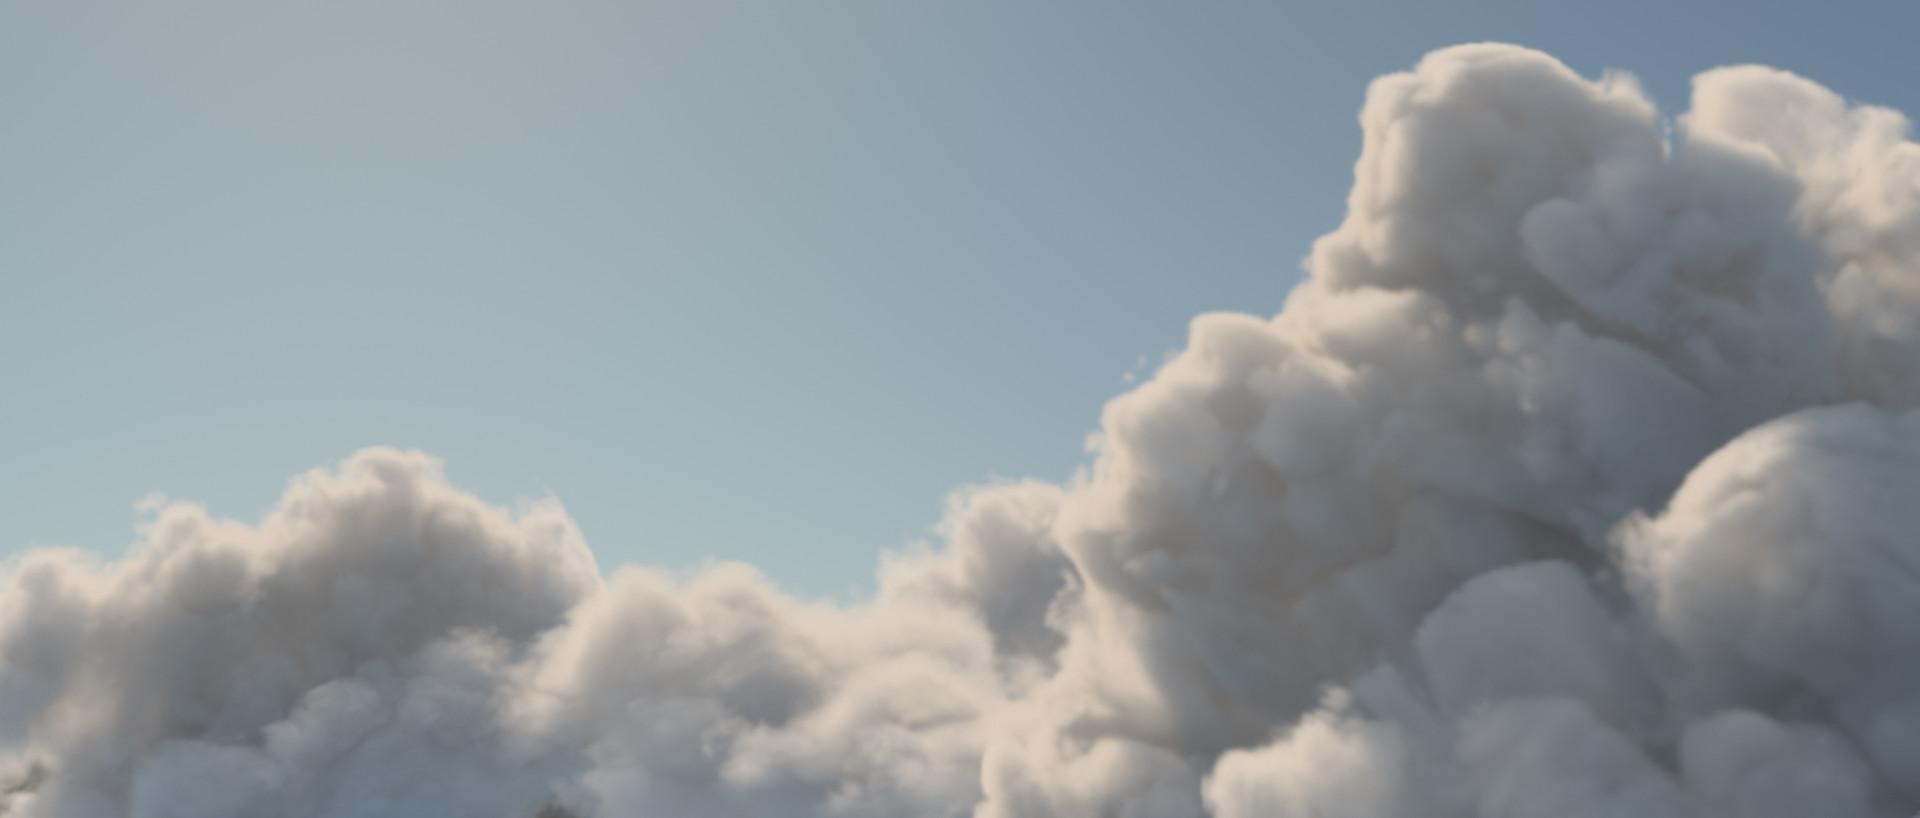 ArtStation - Volumetric Cloud Series I, Sonja Christoph